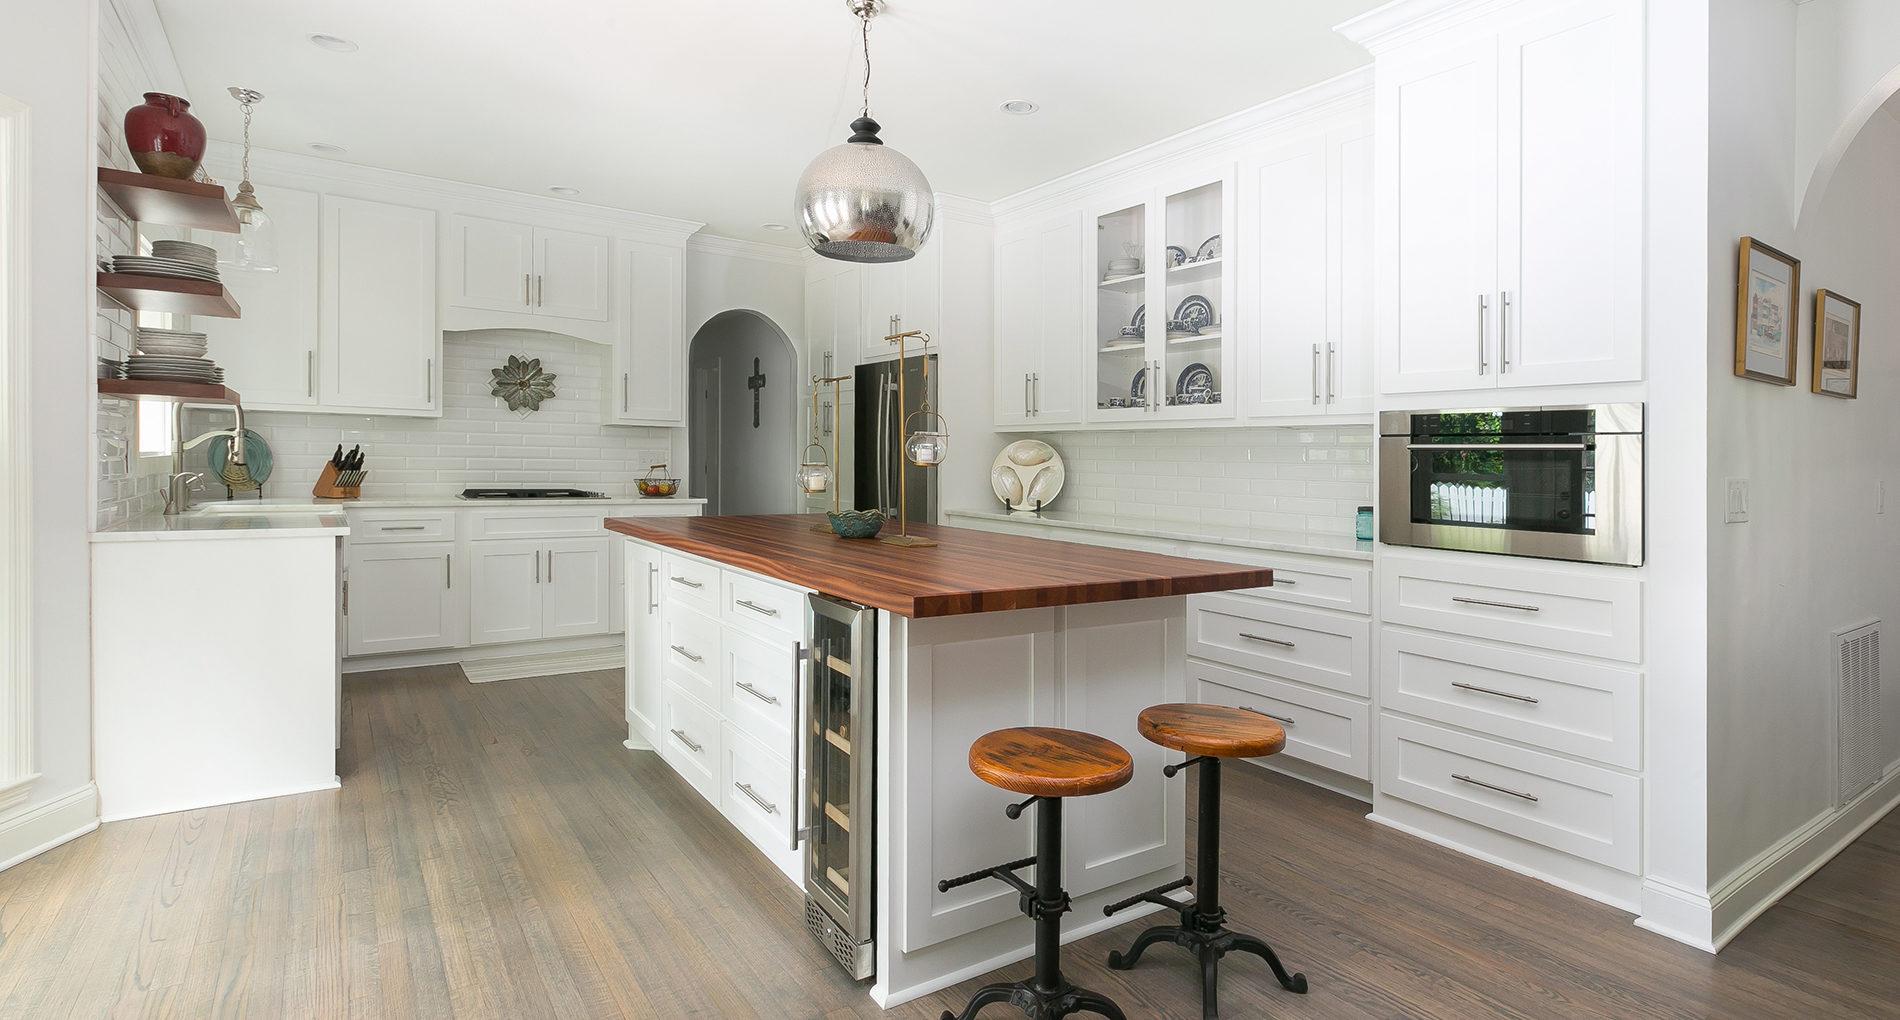 Kitchen Remodeling Gallery Alair Homes Charleston